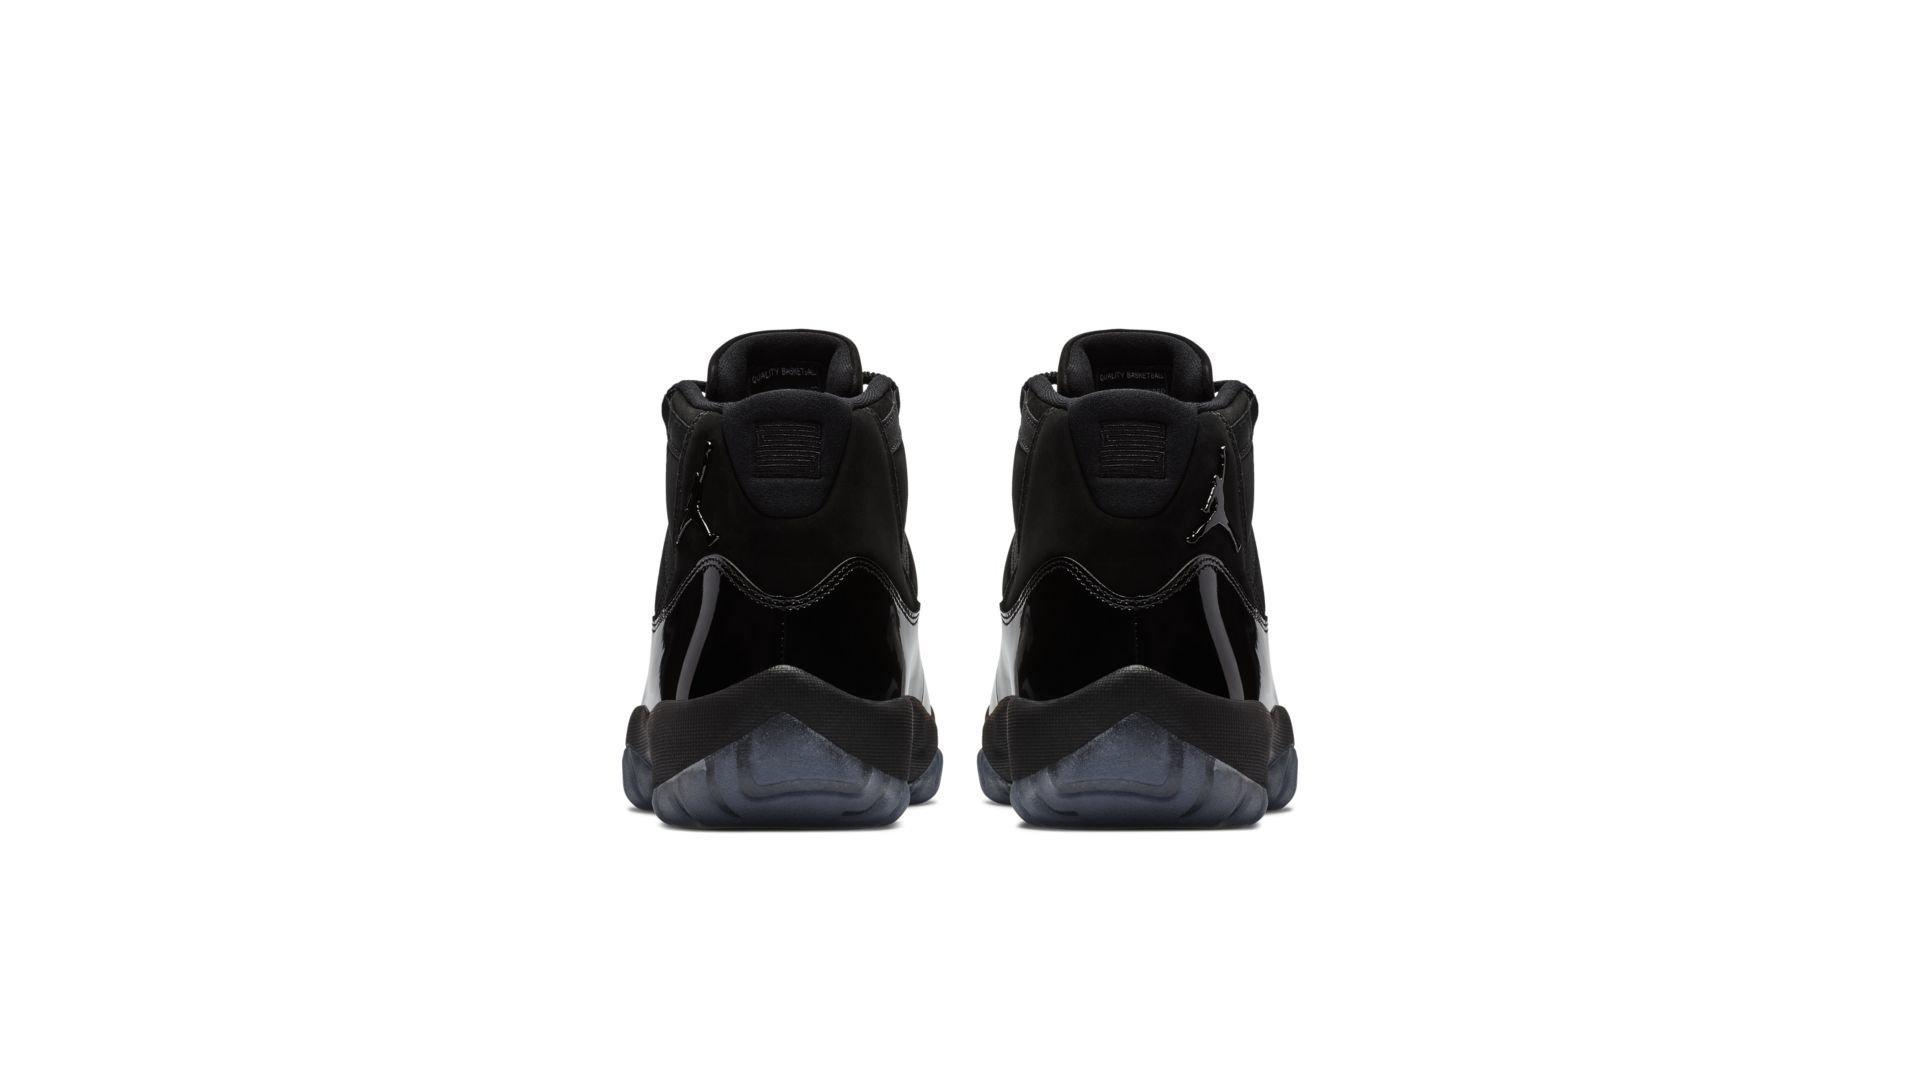 Jordan 11 Retro Cap and Gown (378037-005)